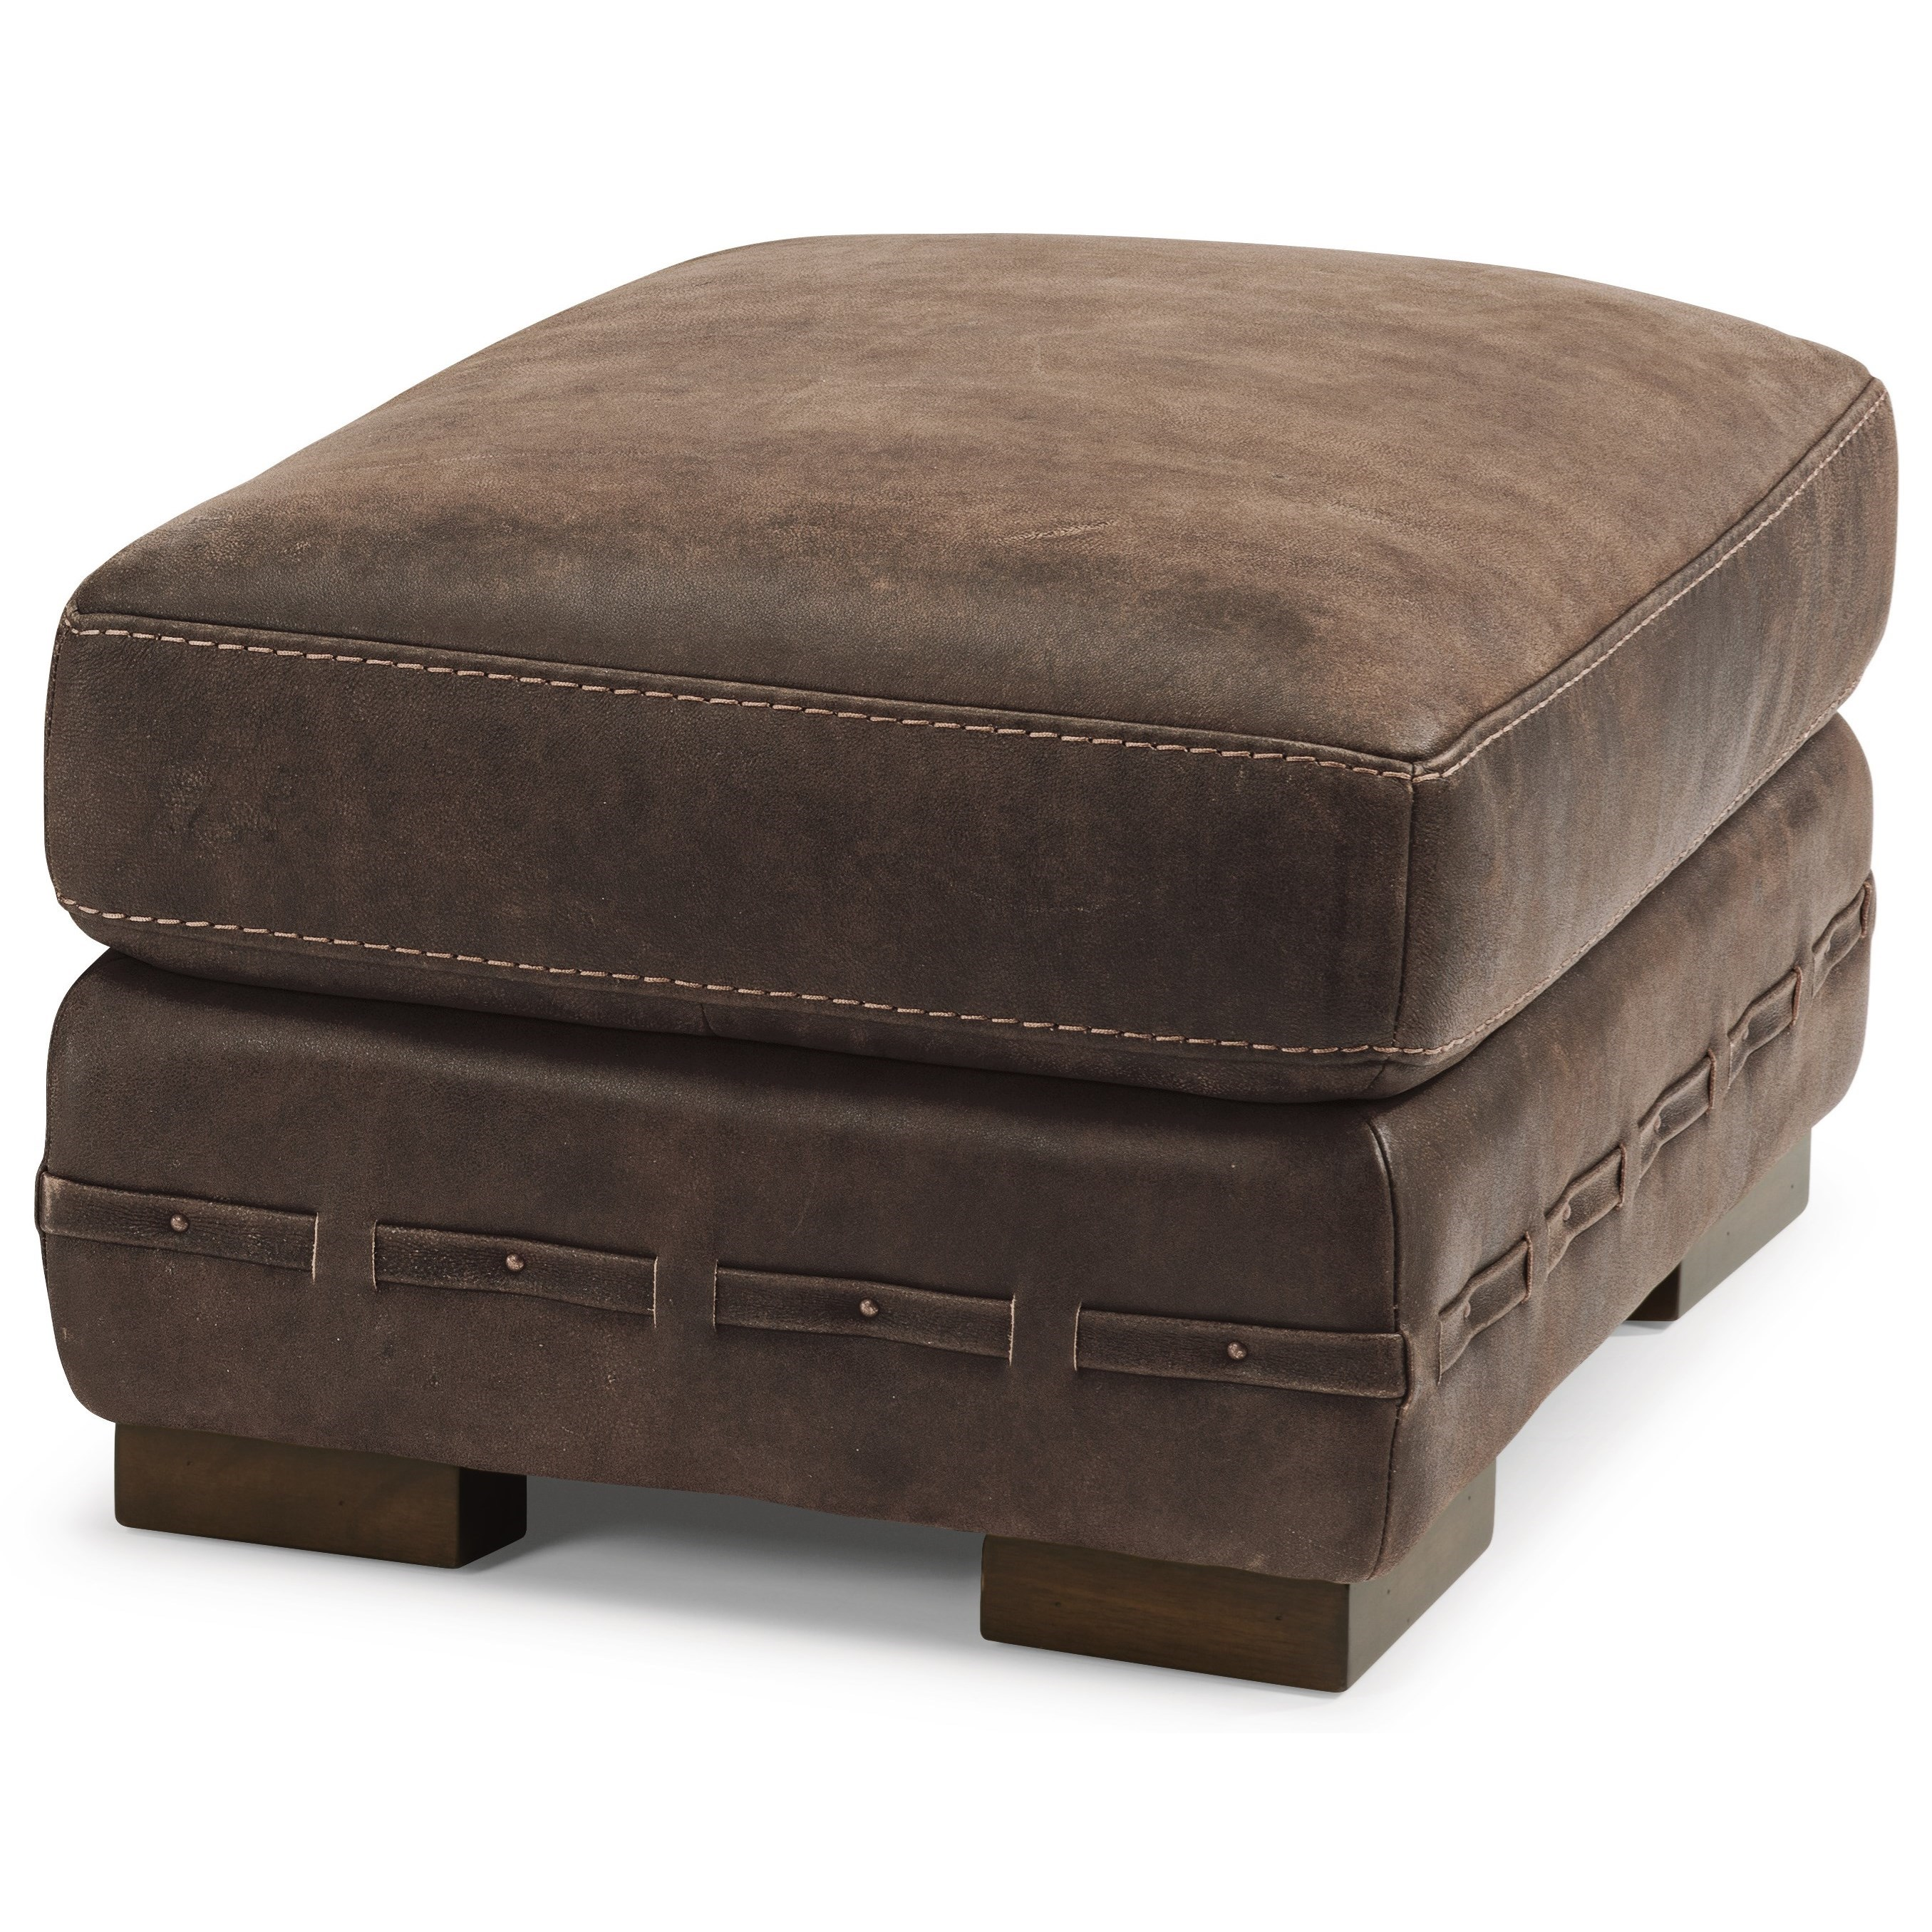 Flexsteel Latitudes Buxton Contemporary Leather Ottoman